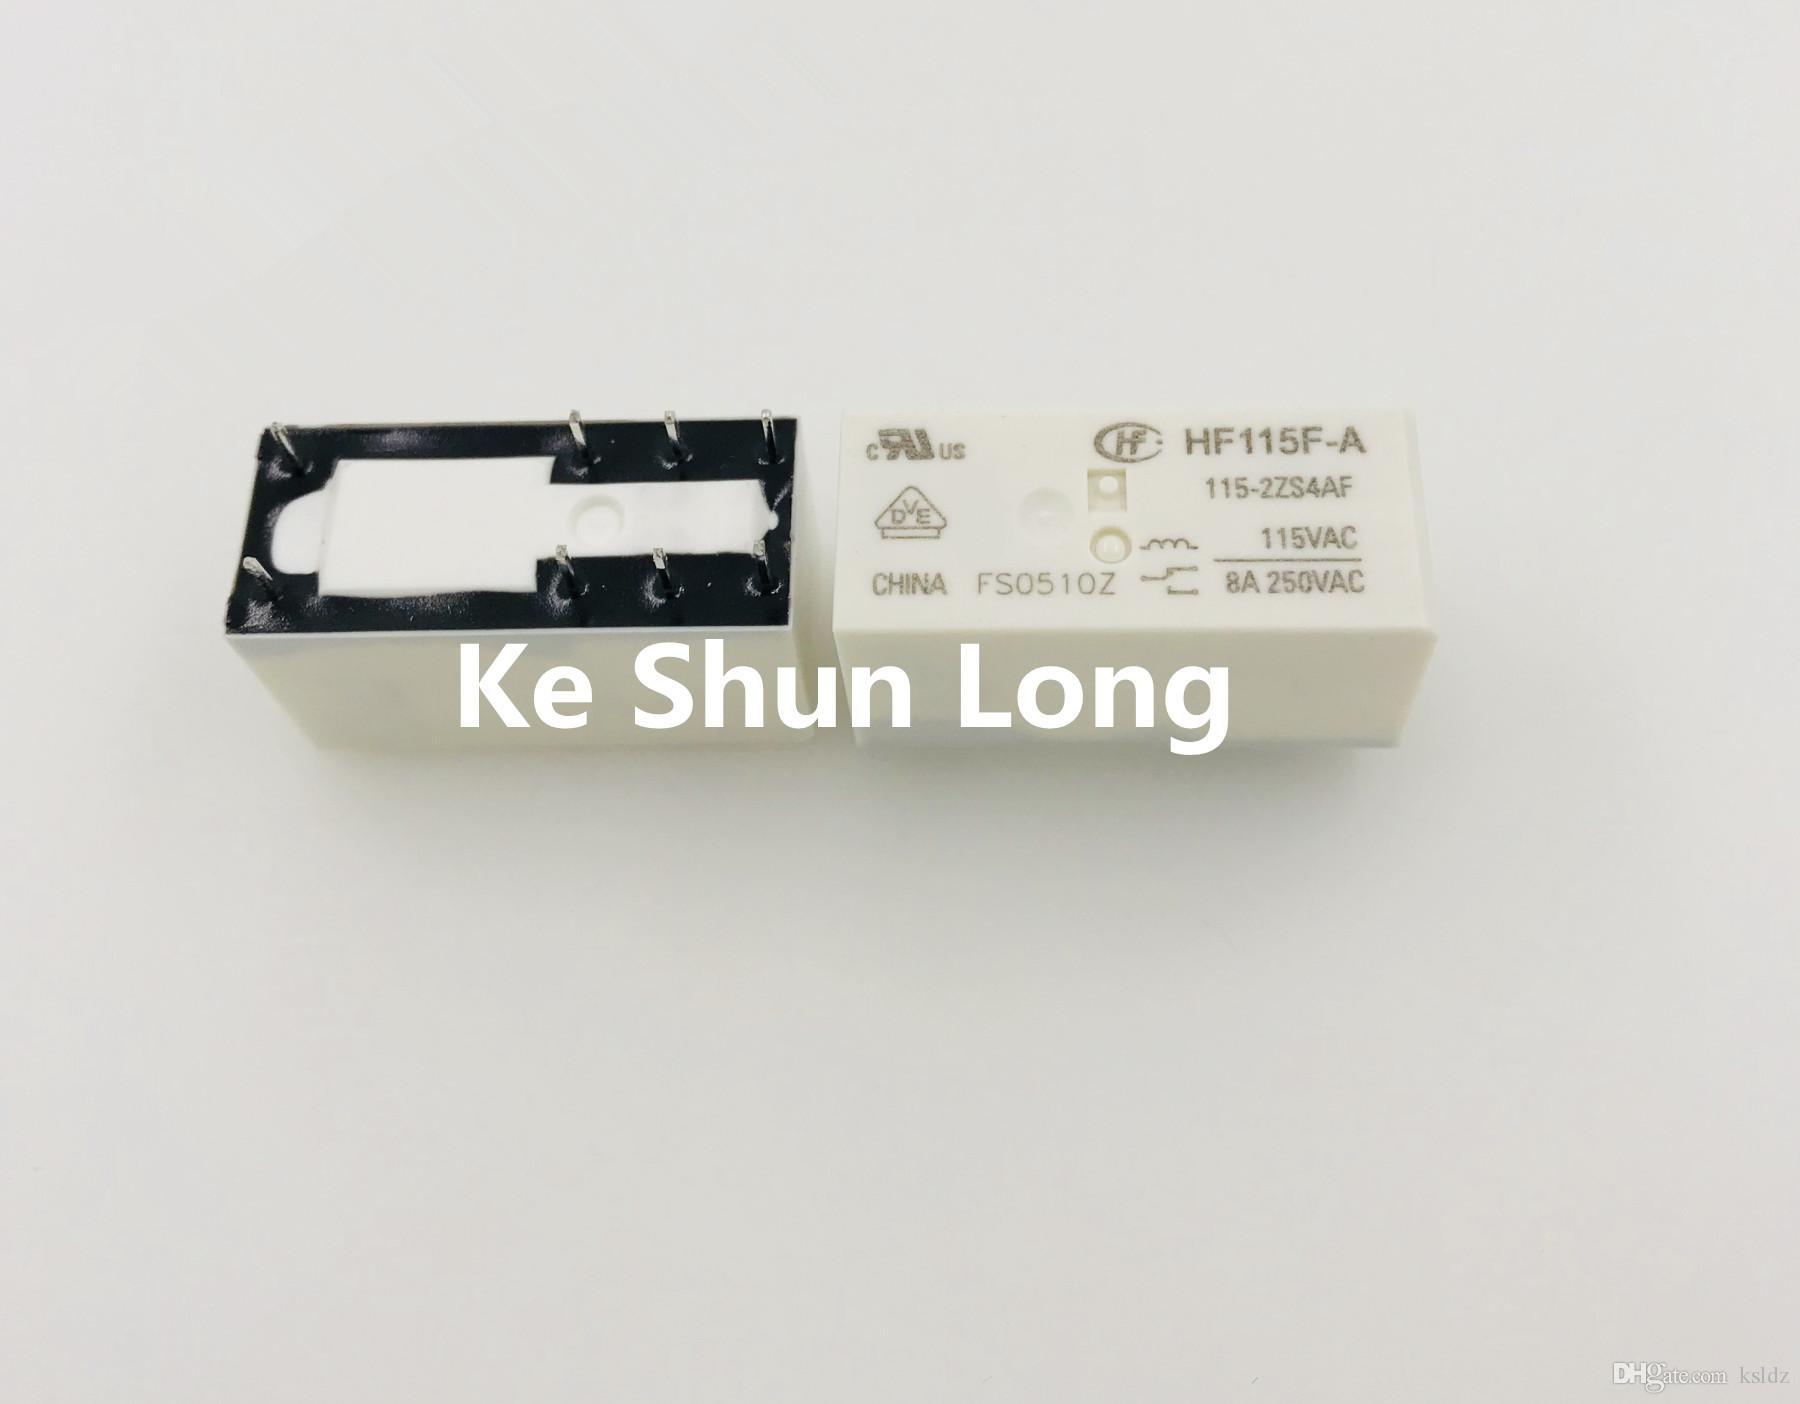 Free shipping(5pieces/lot)Original New HF115F-A-024-2ZS4AF HF115F-A-115-2ZS4AF HF115F-A-230-2ZS4AF 8PINS 8A250VAC Power Relay